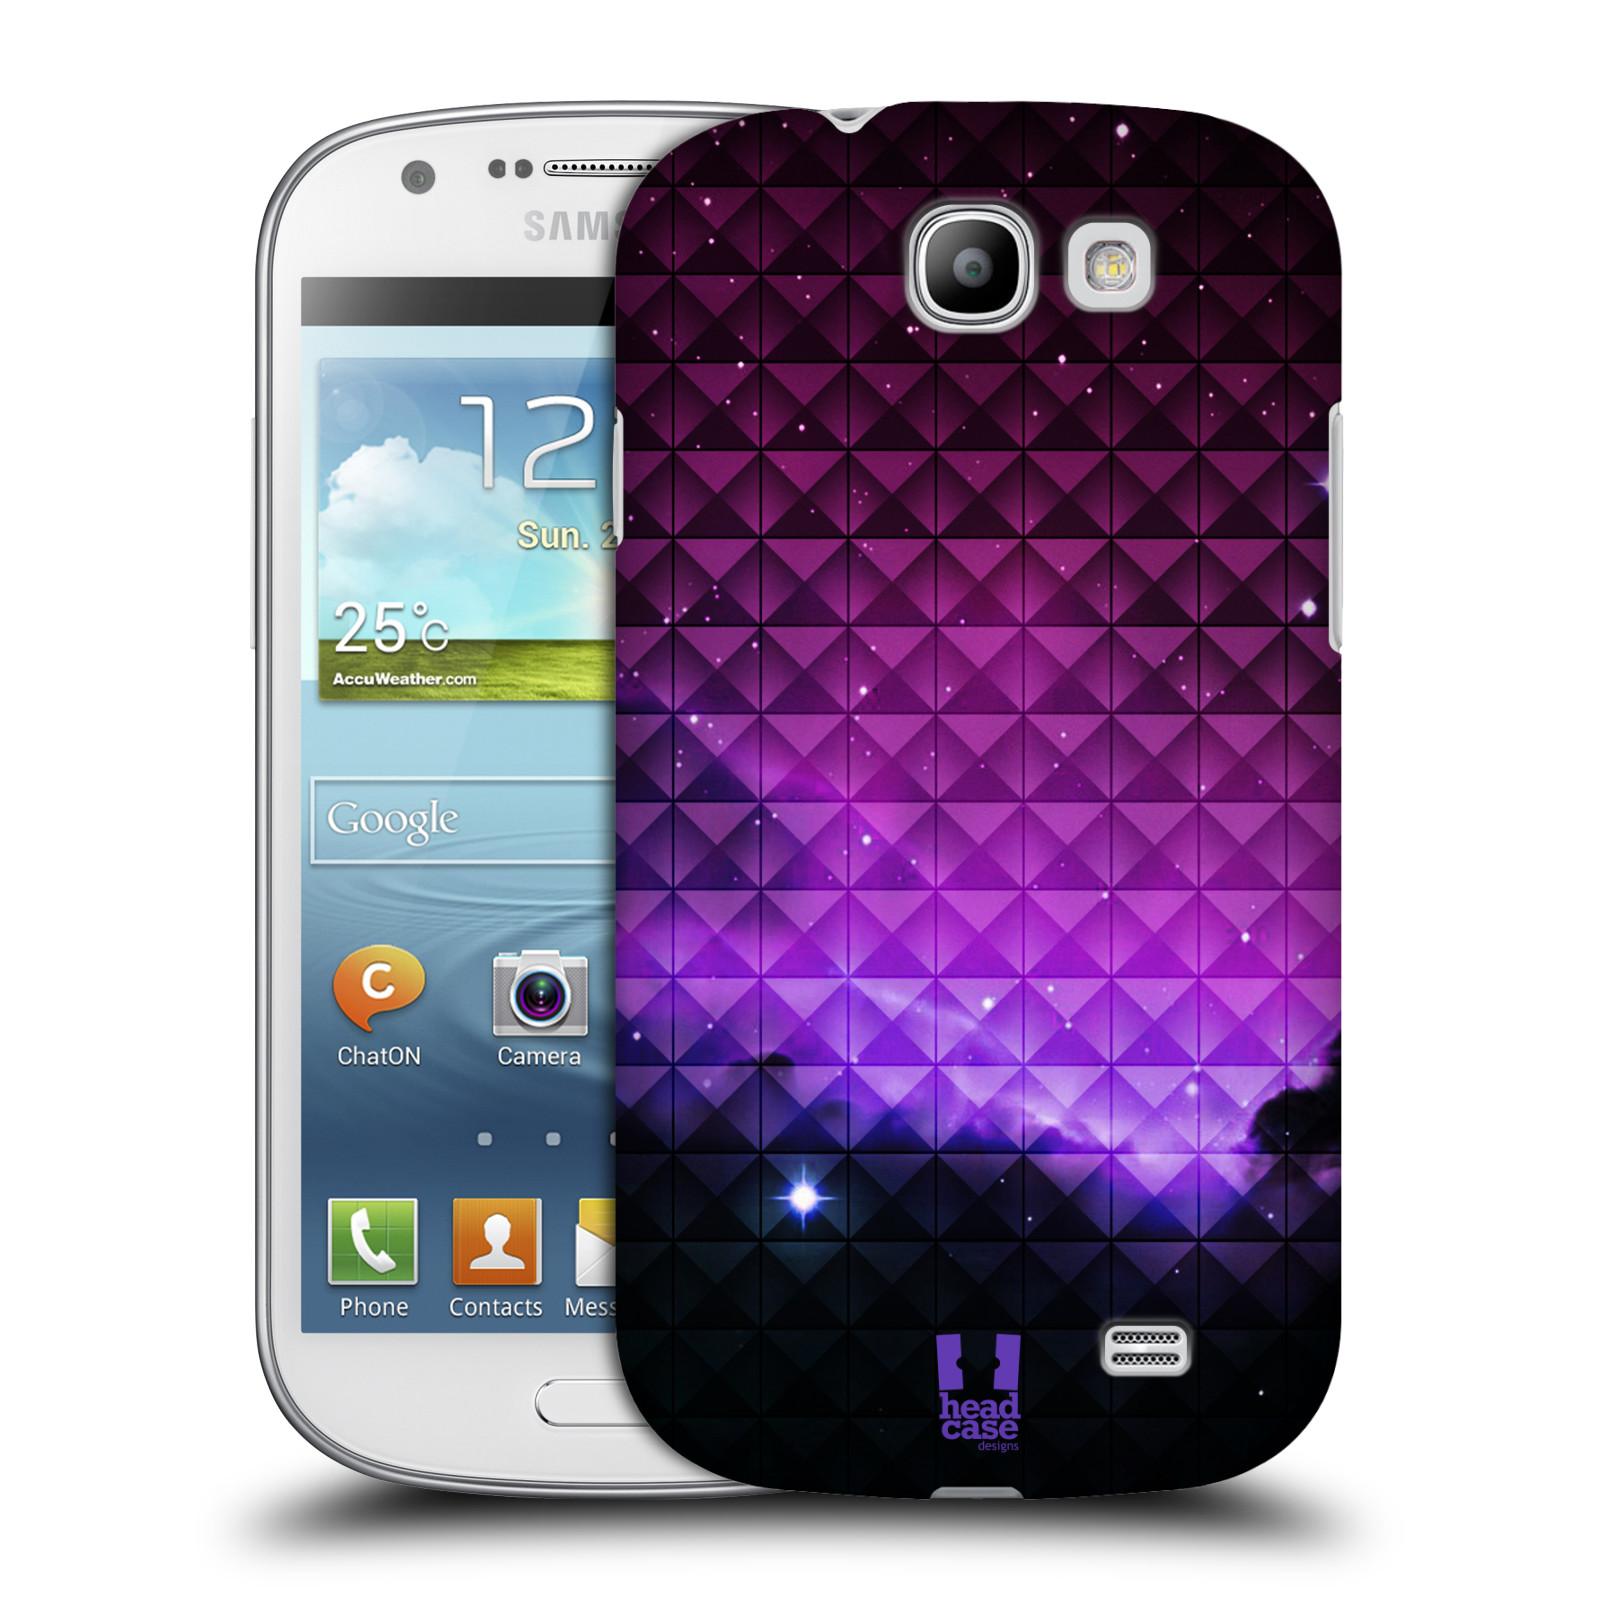 Plastové pouzdro na mobil Samsung Galaxy Express HEAD CASE PURPLE HAZE (Kryt či obal na mobilní telefon Samsung Galaxy Express GT-i8730)